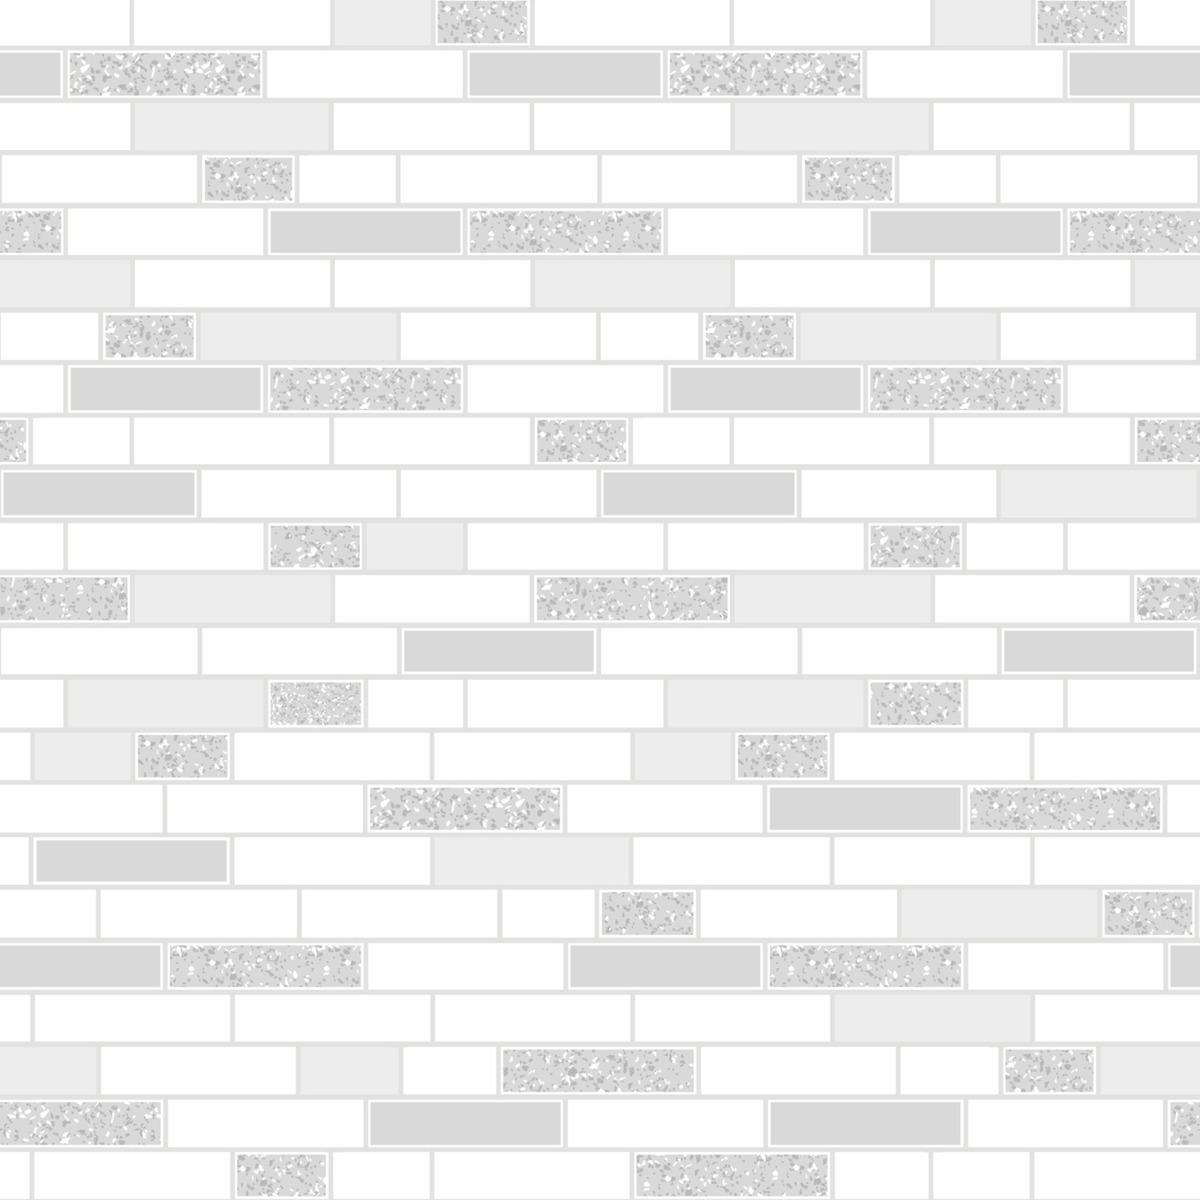 Tiling on a Roll Oblong Granite Tile Wallpaper - Grey Holden 89193